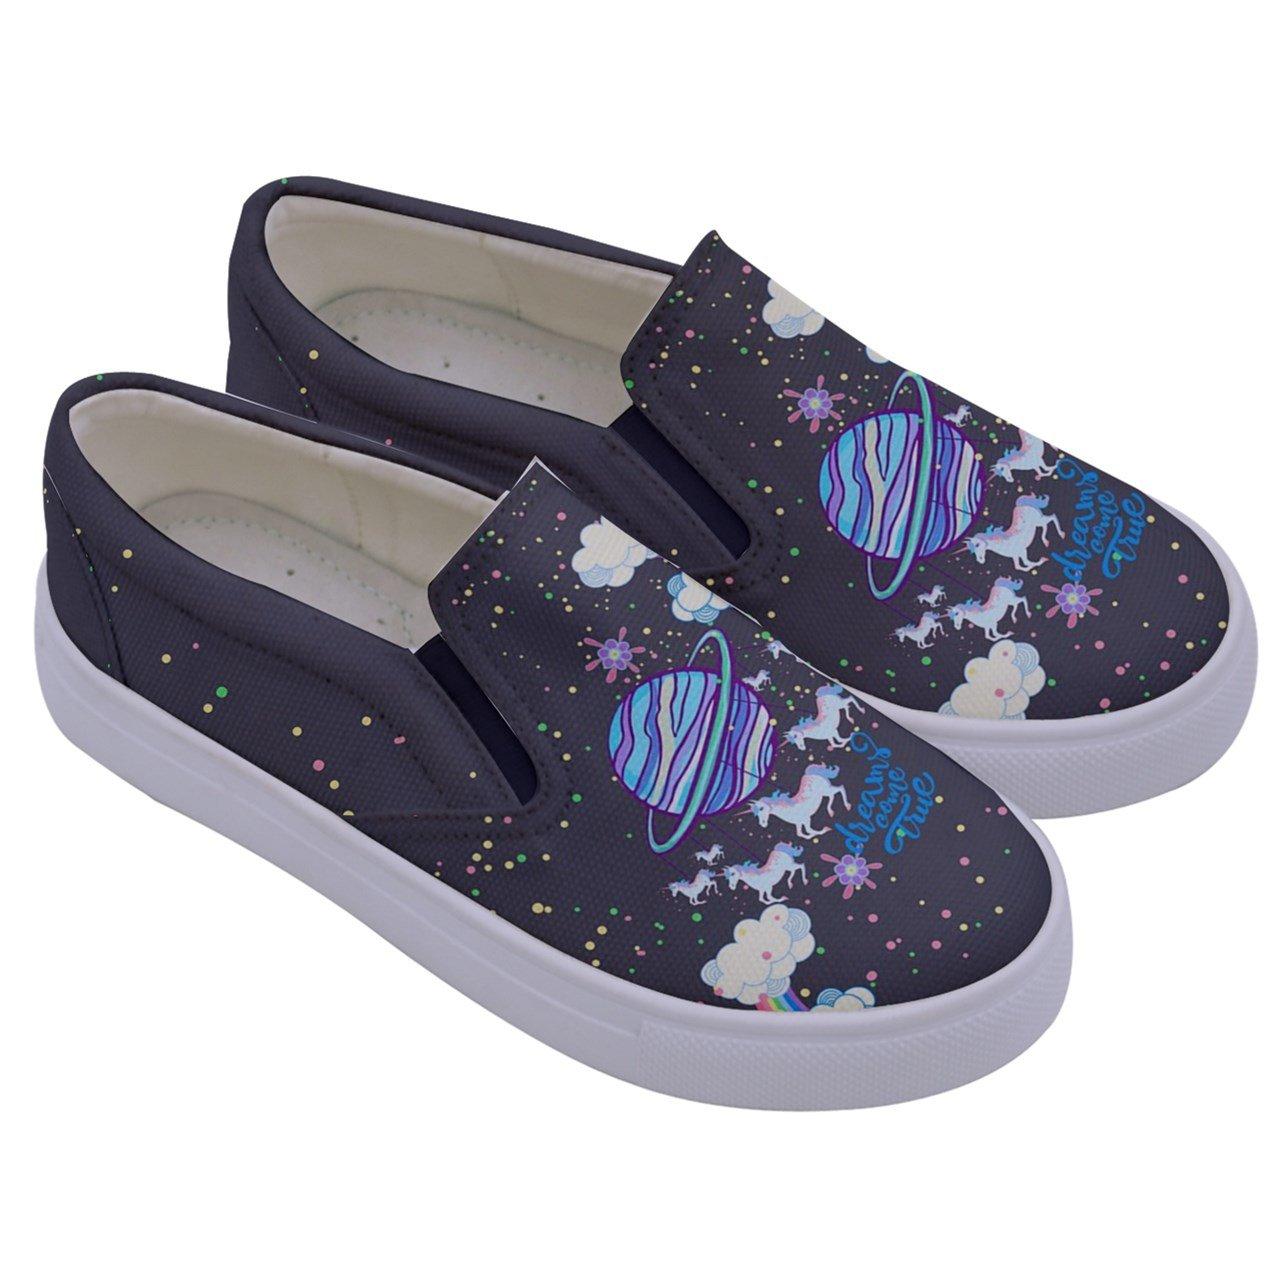 PattyCandy Girls Elegant Unicorn Kids Canvas Slip-On Shoes Size:US 8C-7Y PattyCandy-129839444